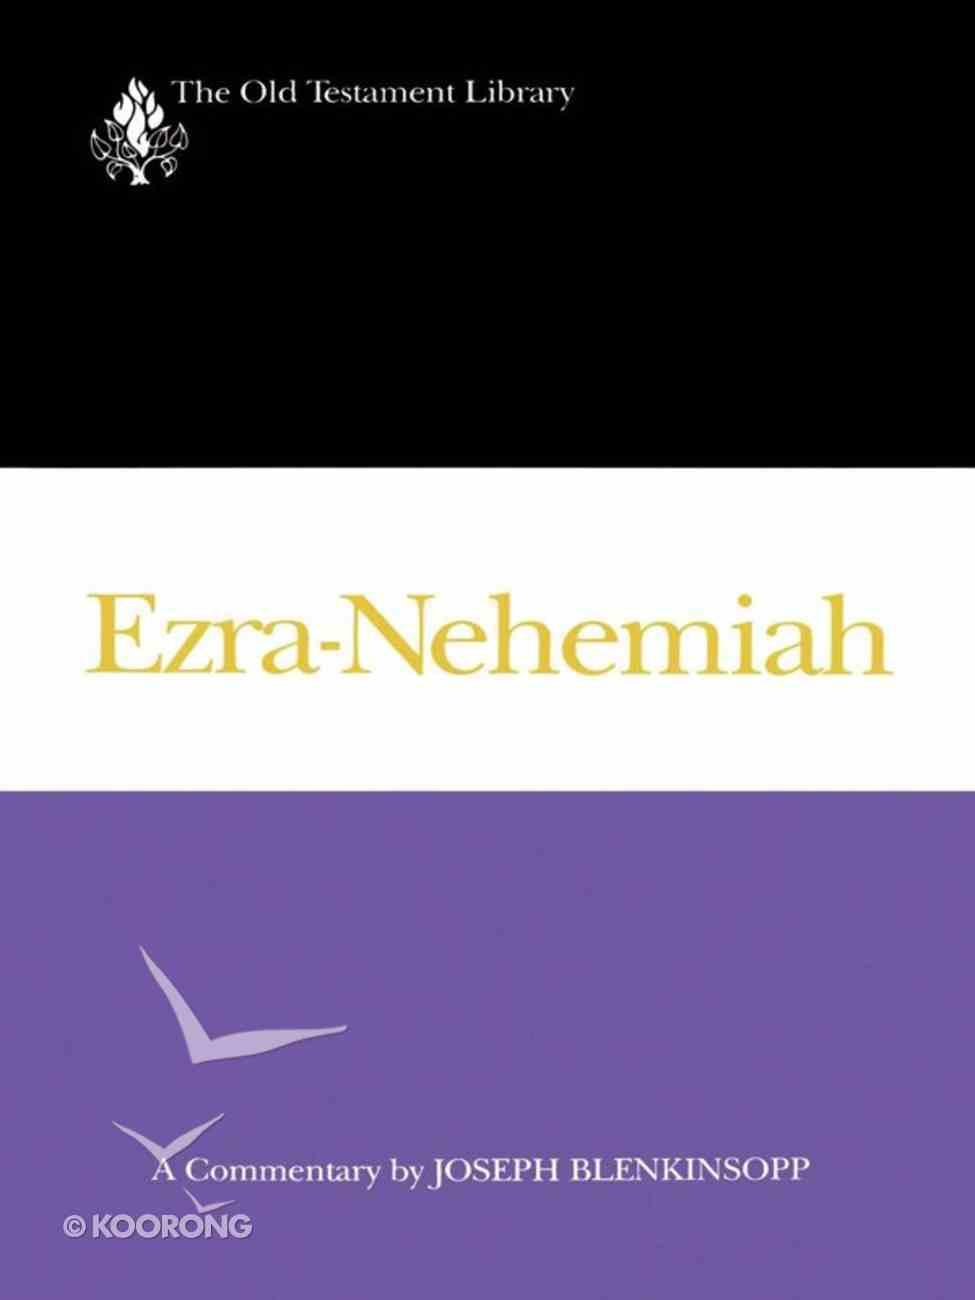 Ezra-Nehemiah (1988) (Old Testament Library Series) eBook